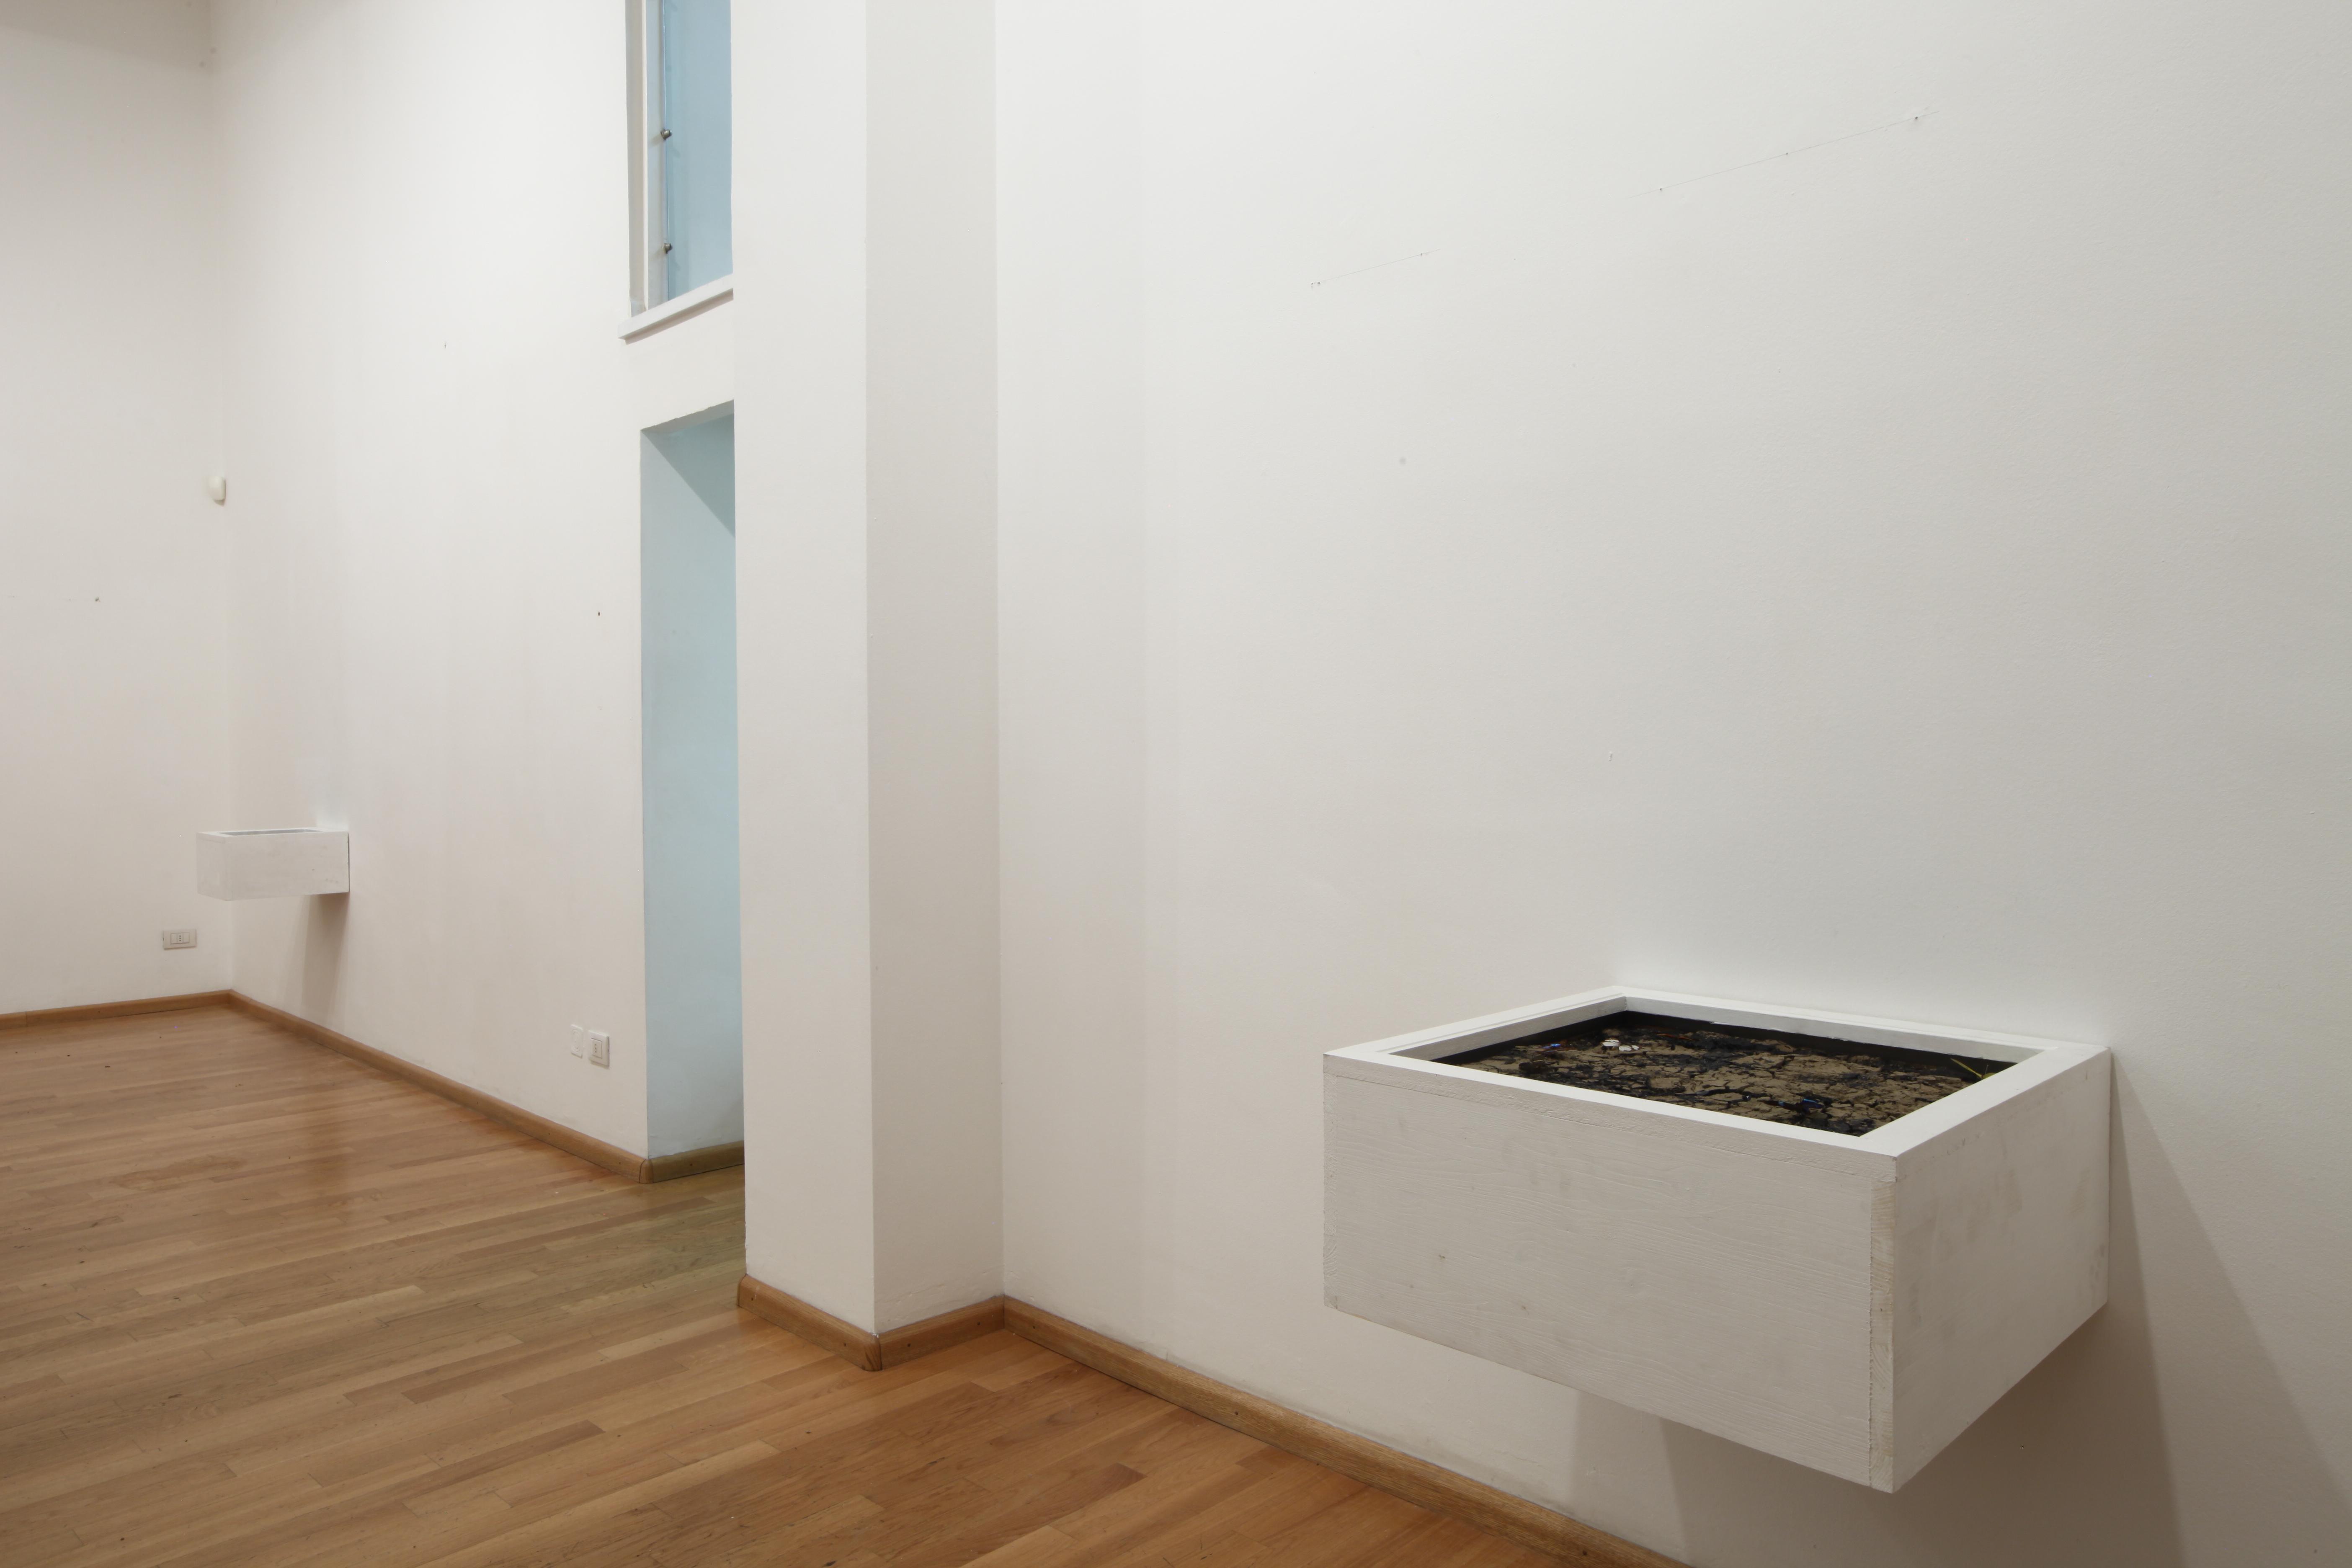 Eltjon Valle, Nuova Galleria Morone